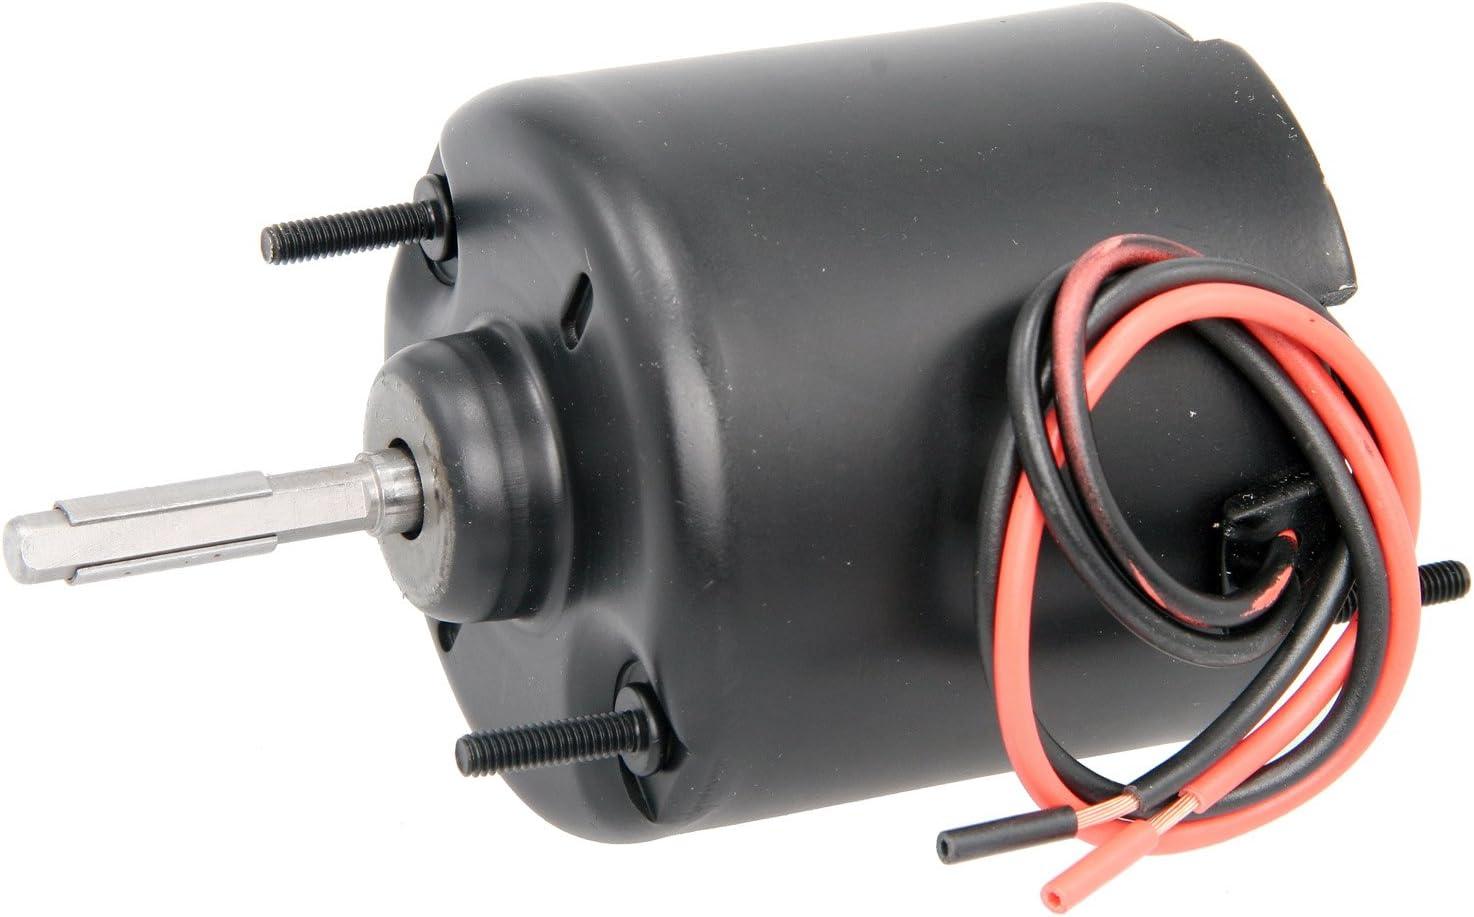 Four Seasons/Trumark 35576 Blower Motor without Wheel